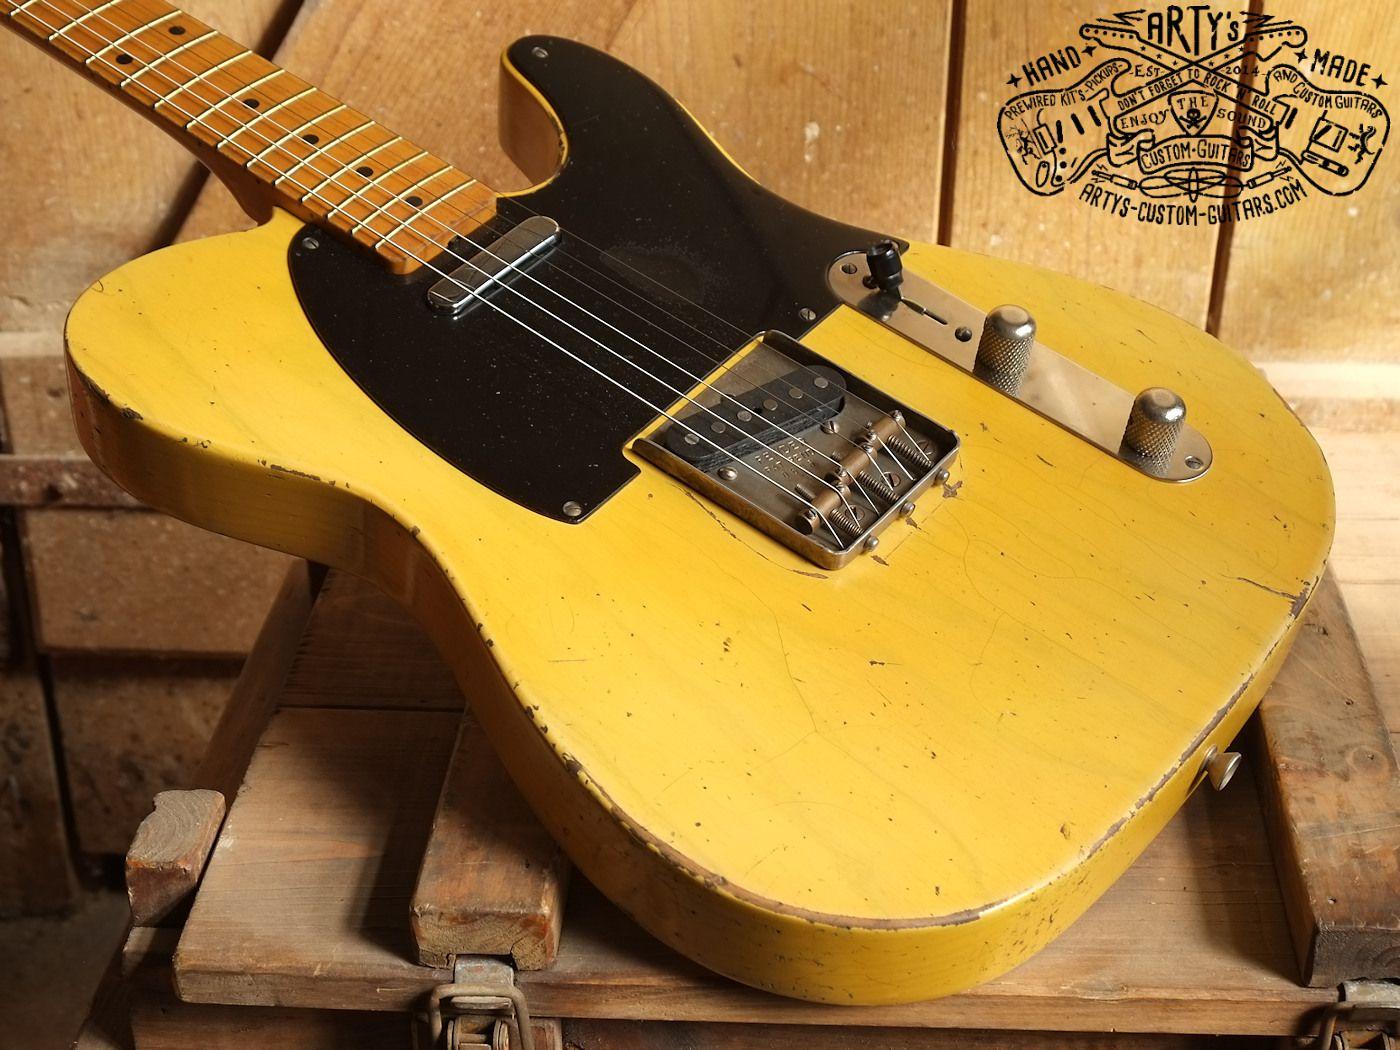 Broadcaster 1950 Arty S Relic Repro Nocaster Blackguard Tele Telecaster Www Artys Custom Guitars Com Fender Vintage Guitar Vintage Bakelite